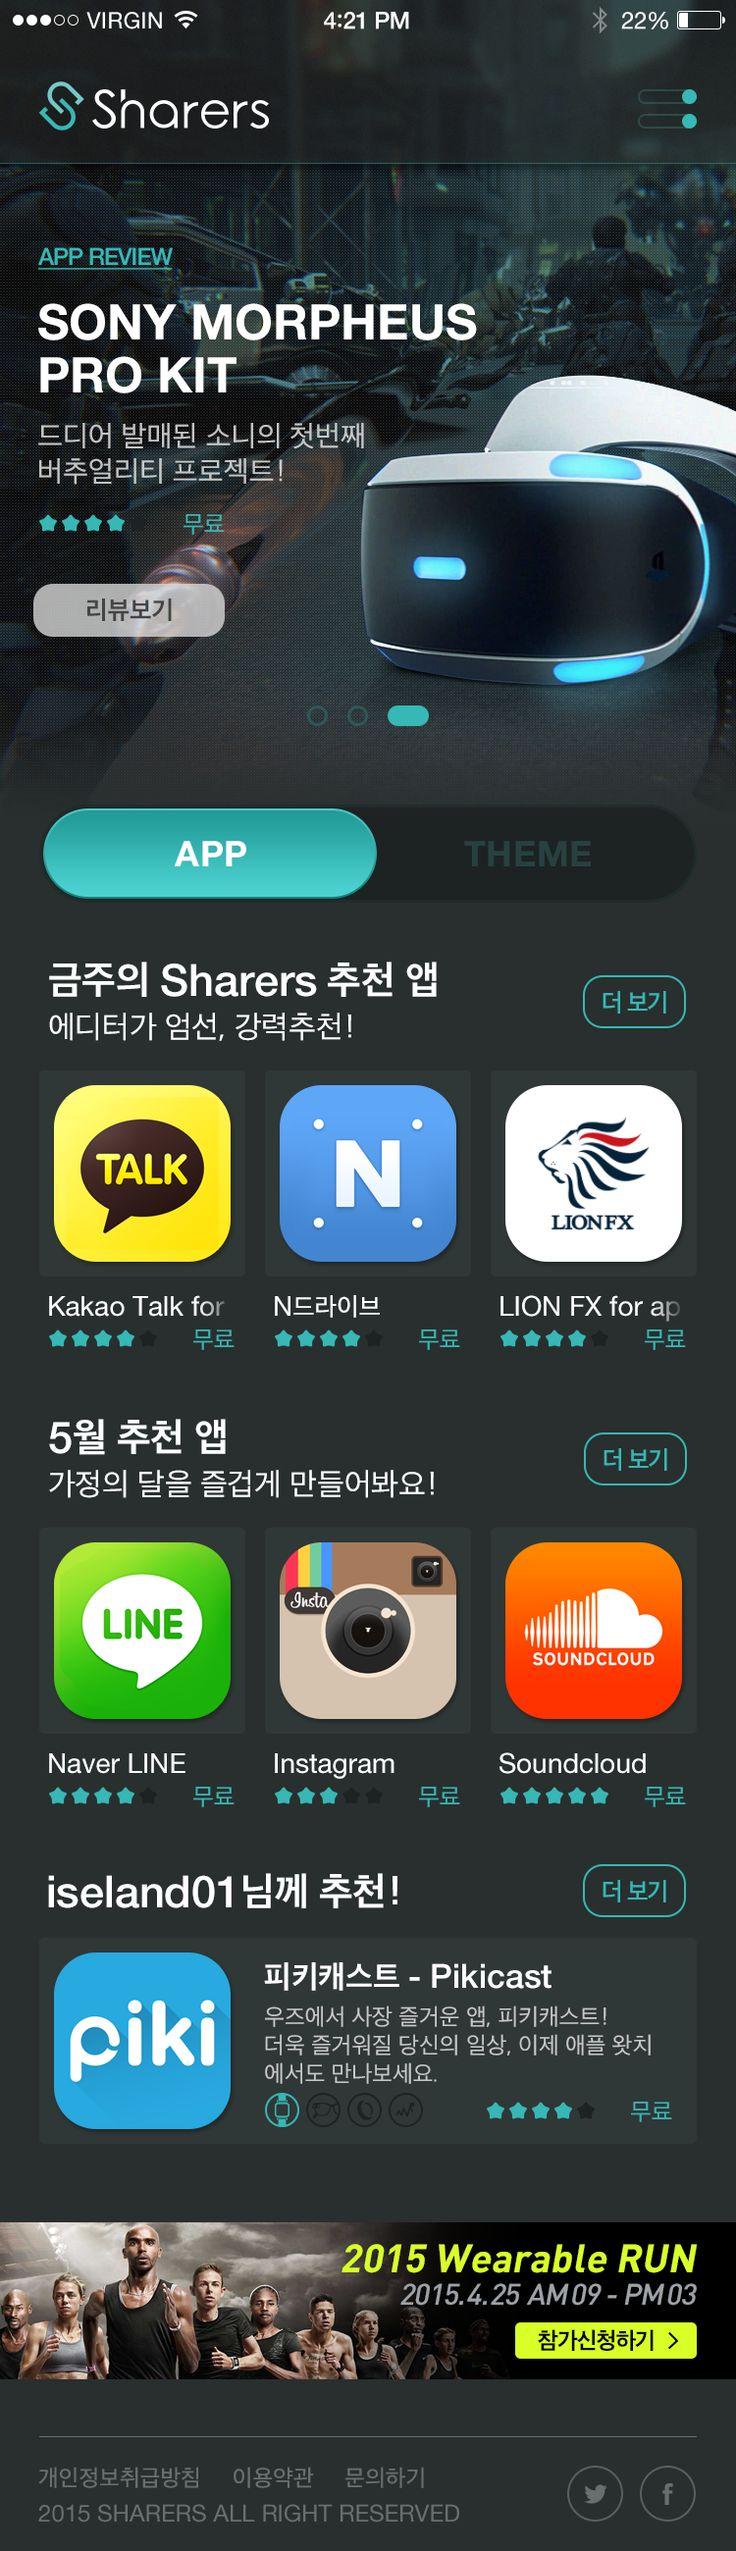 Shaeres app 제안 / 메인 페이지